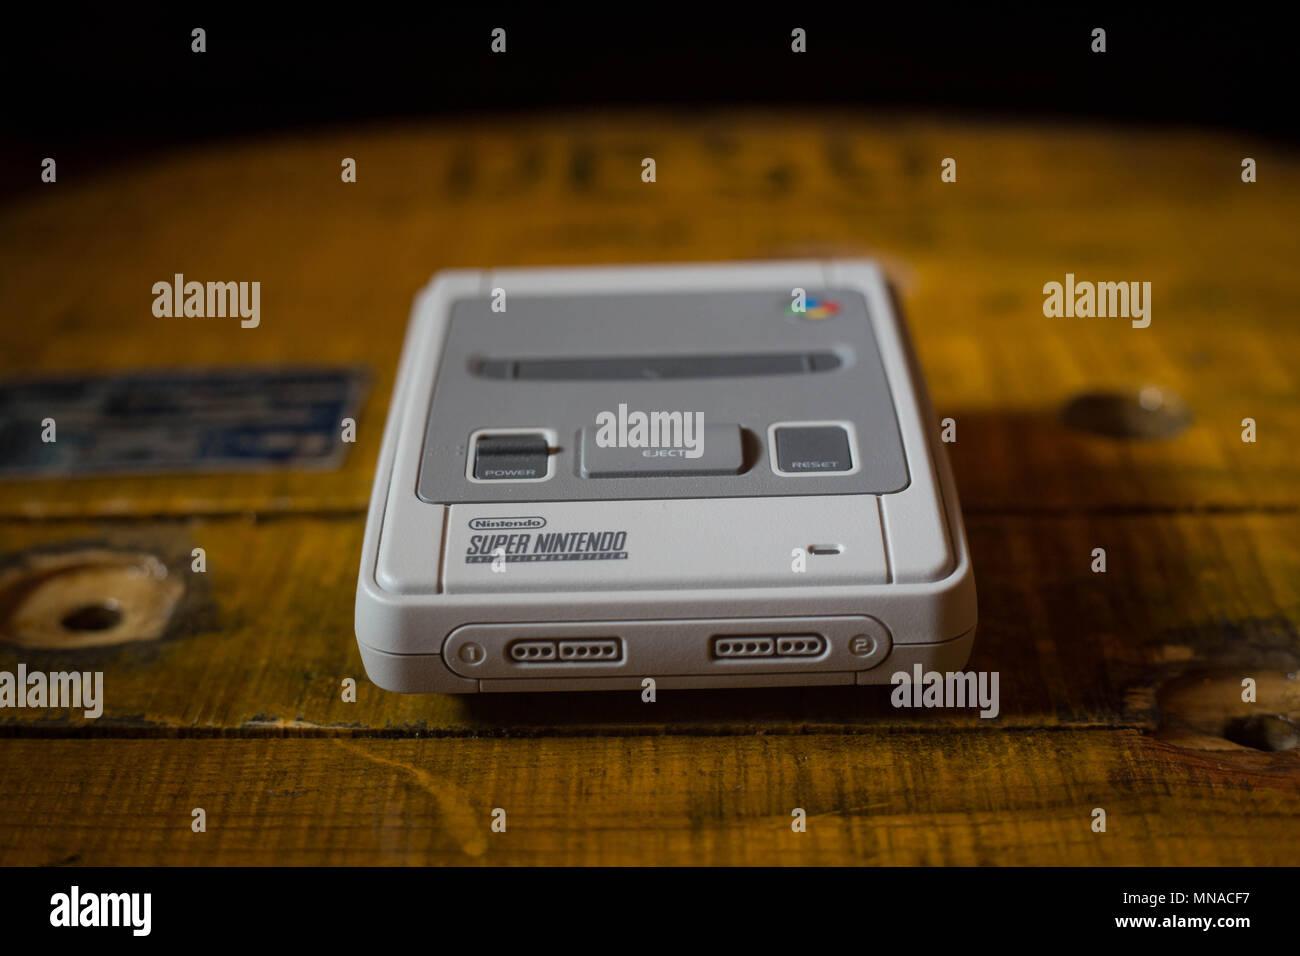 A Nintendo Classic Mini Super Nintendo Video Game Console The